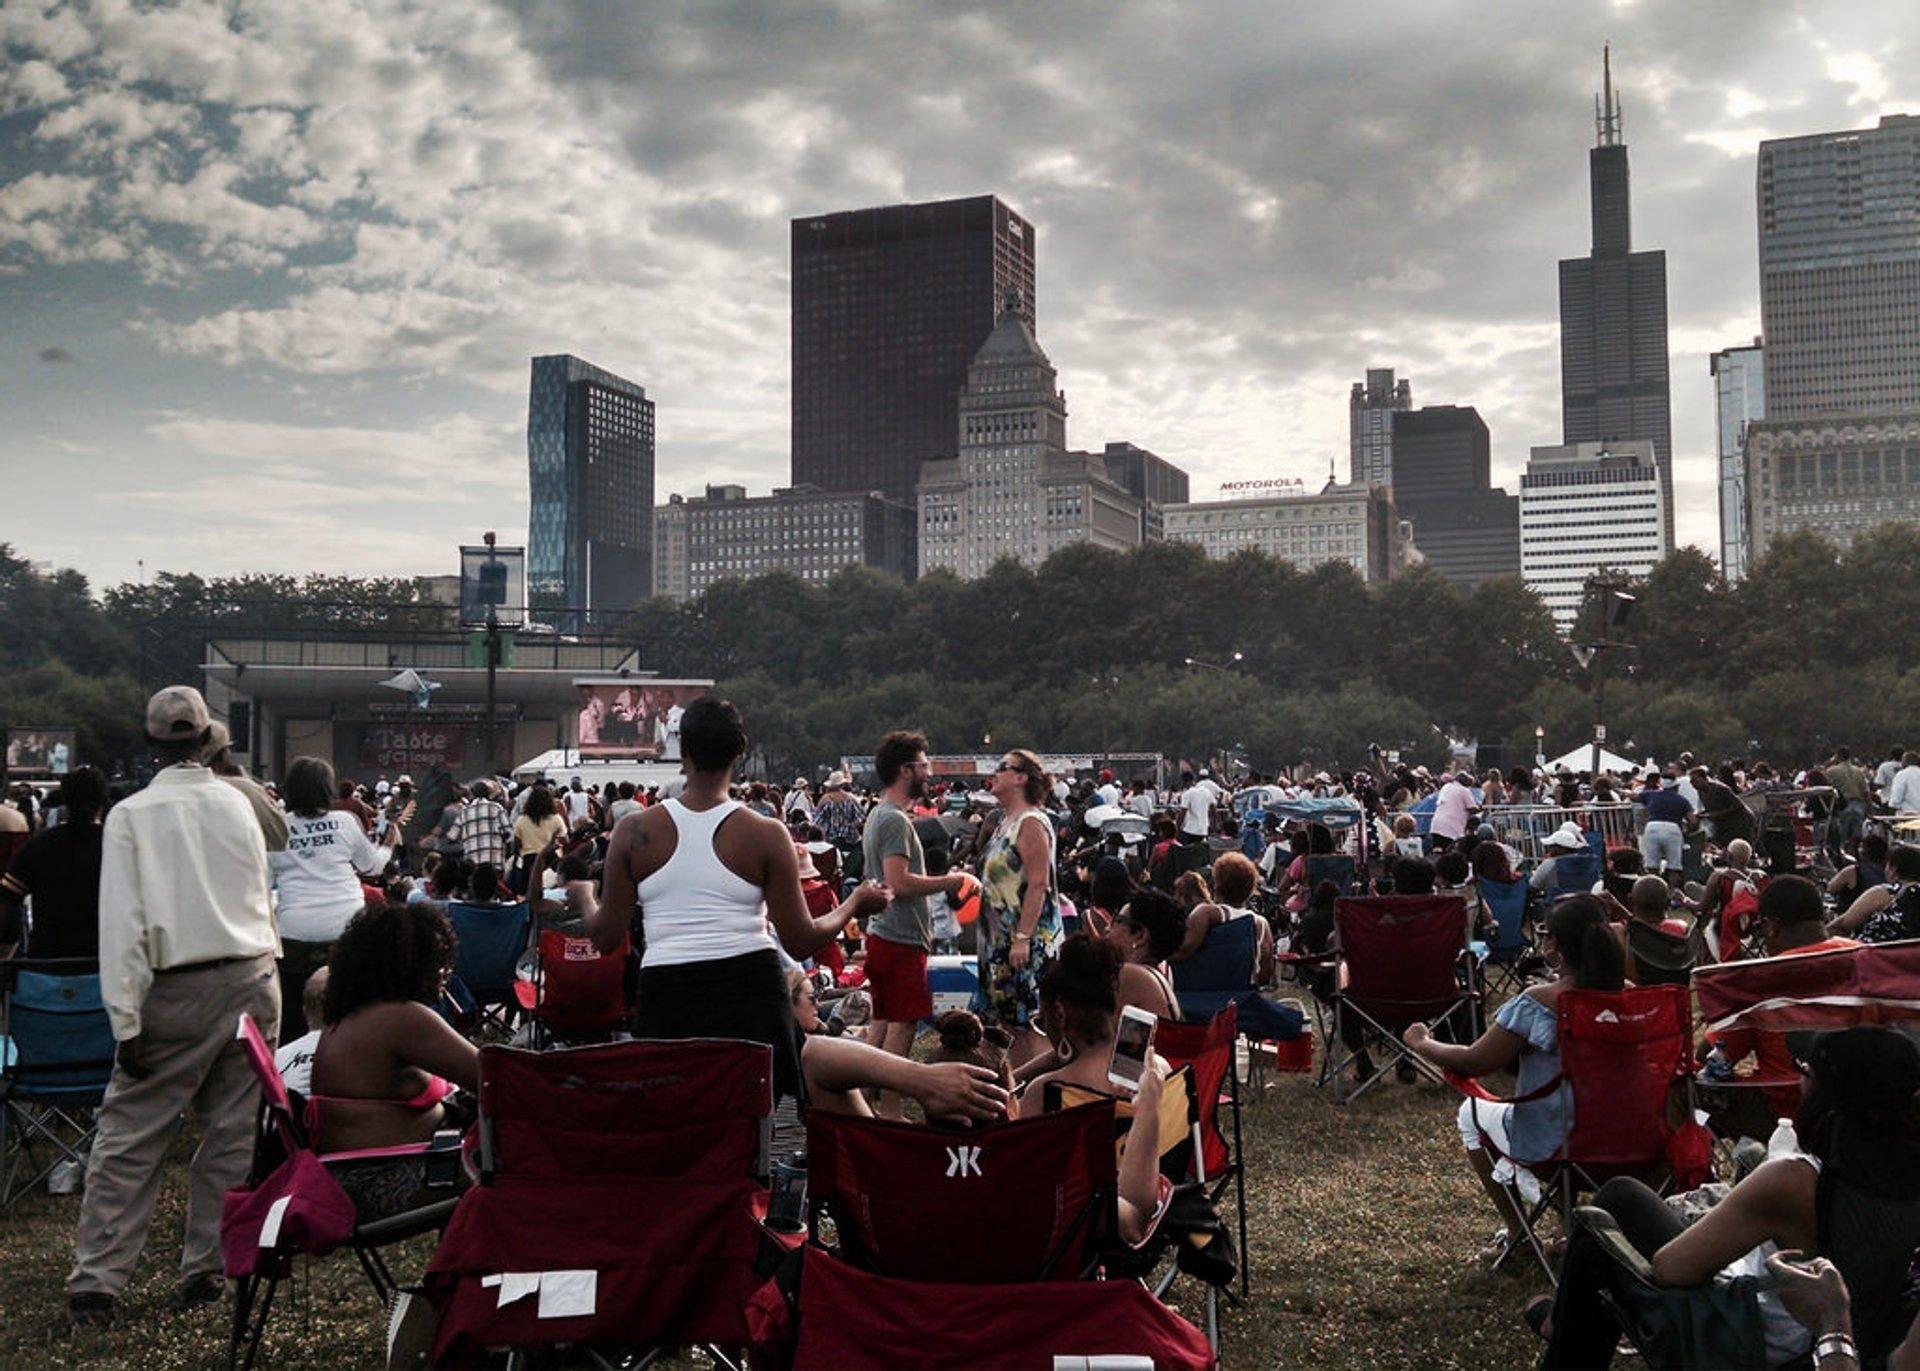 Taste of Chicago in Chicago 2020 - Best Time